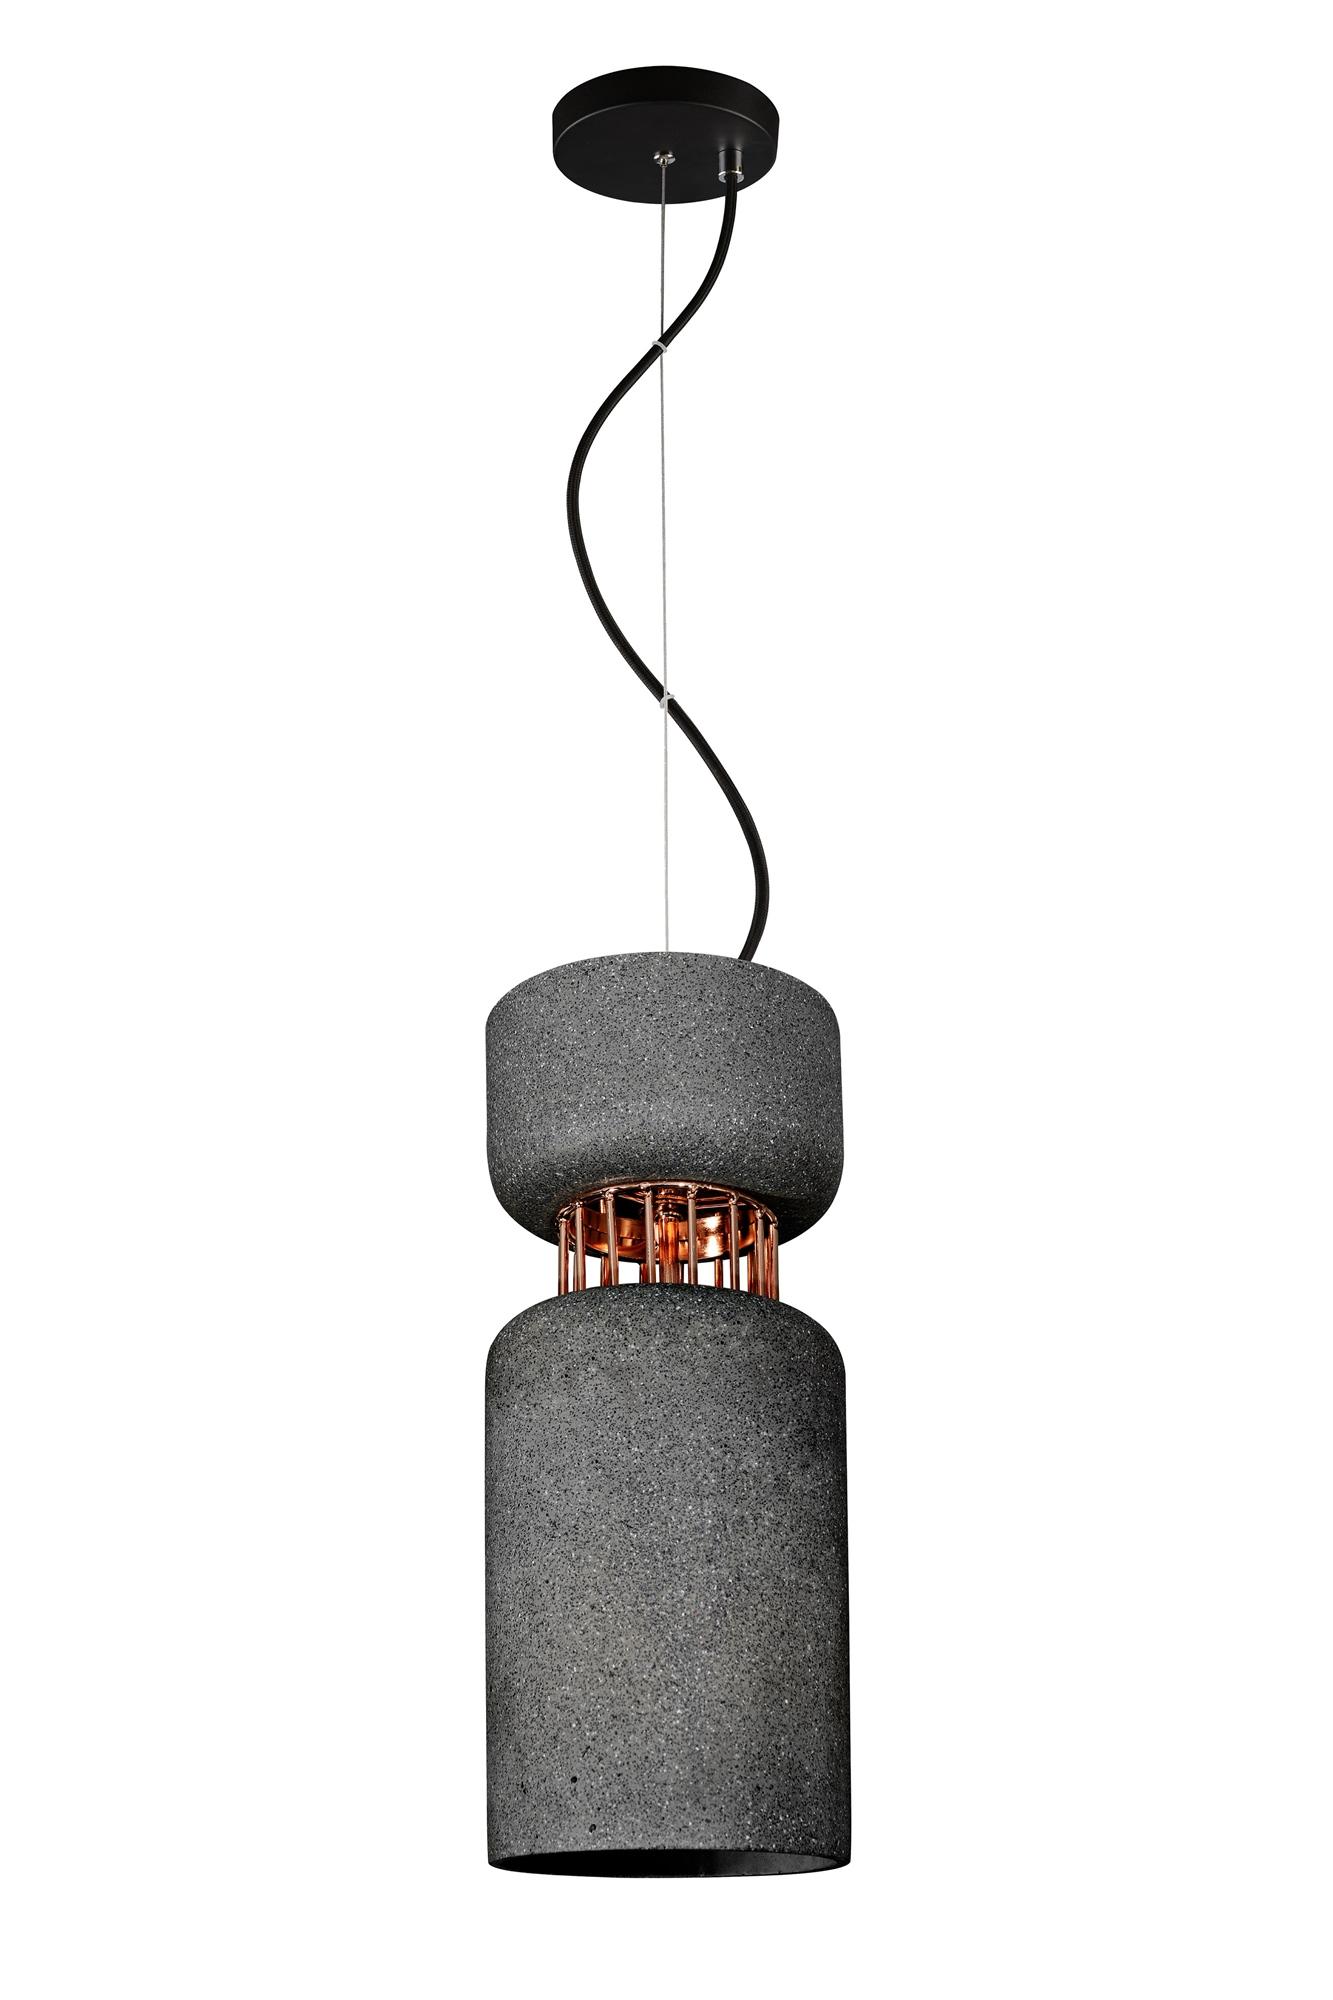 Lampenlux Hängeleuchte Joe Pendellampe 40W E27 Ø16cm Gipsleuchte Schwarz